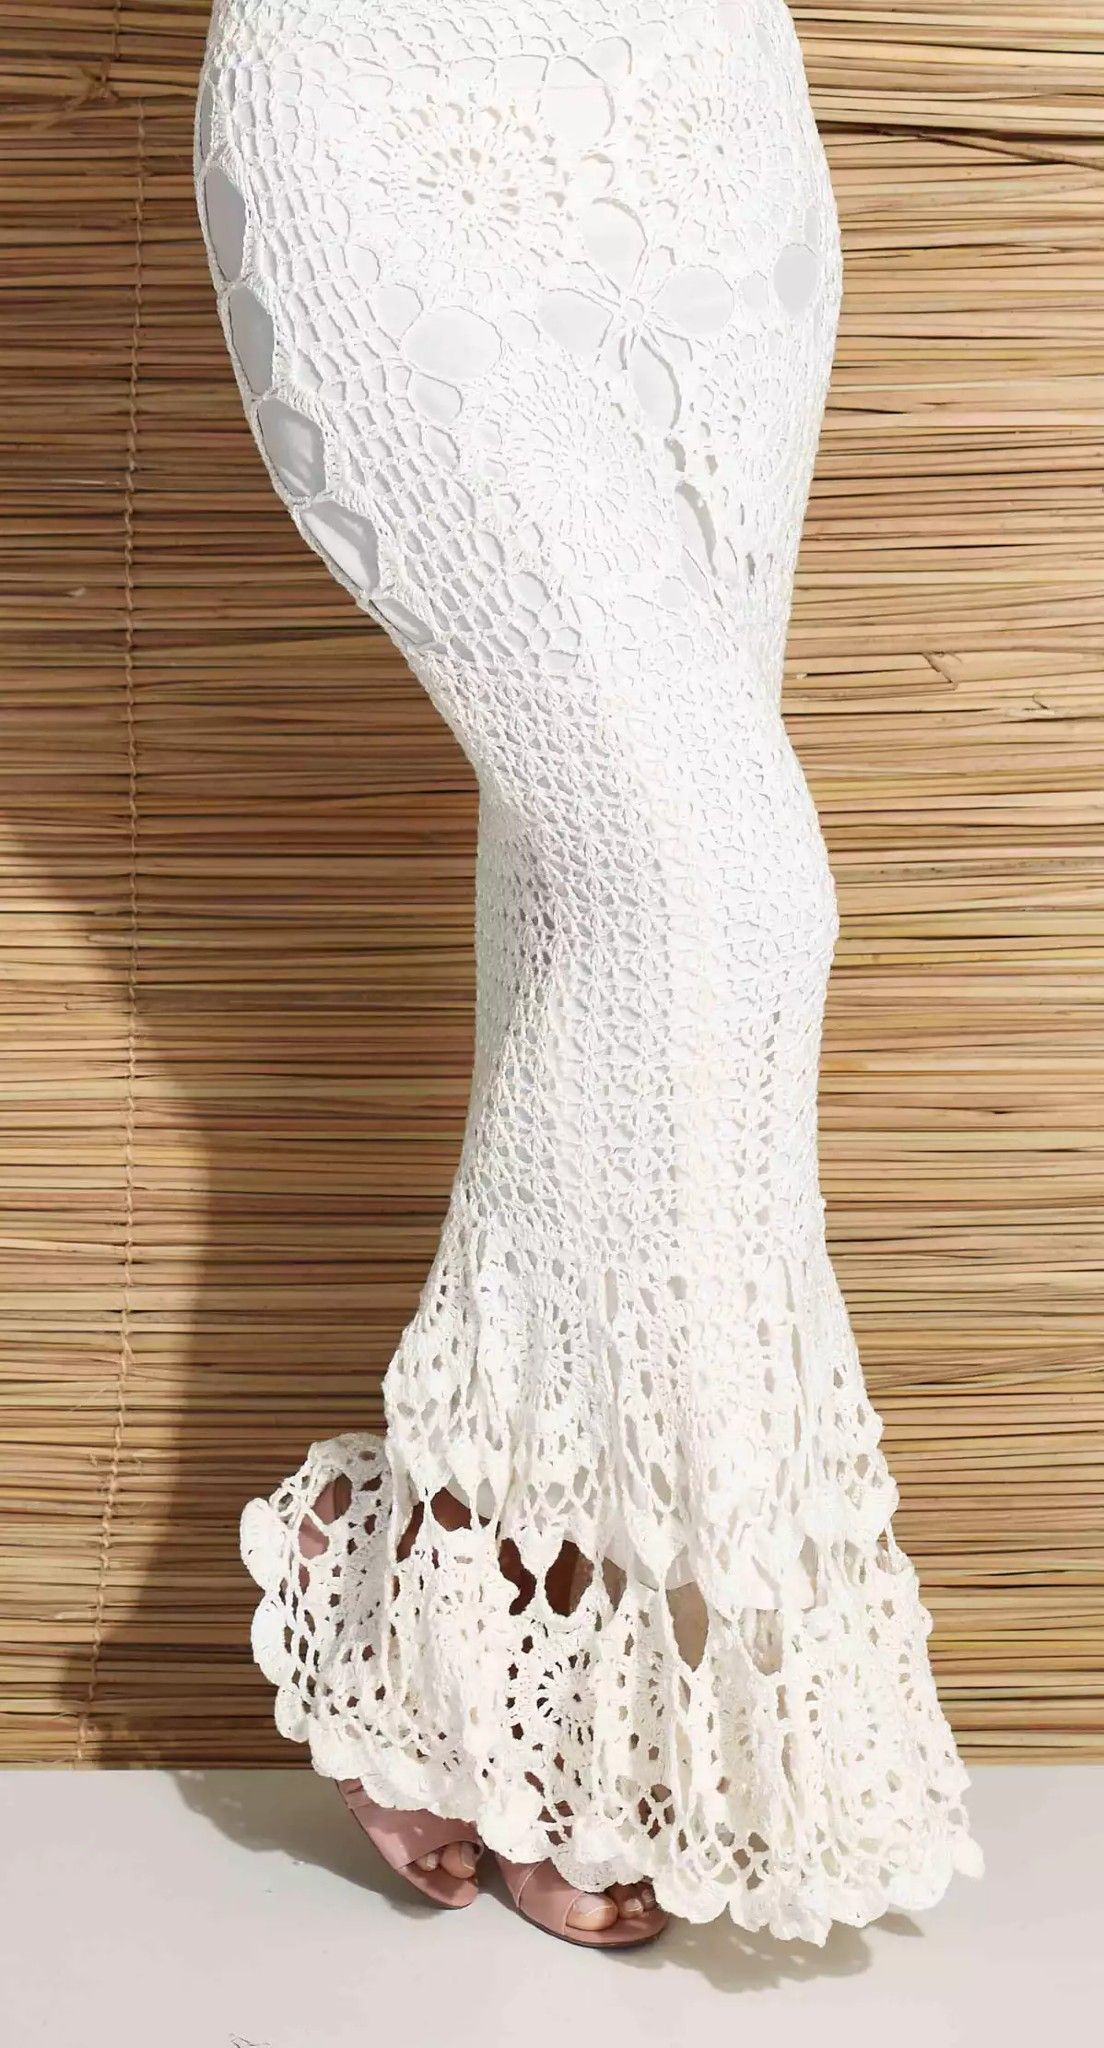 Pin by mary mcevoy on adult clothing pinterest crochet crochet